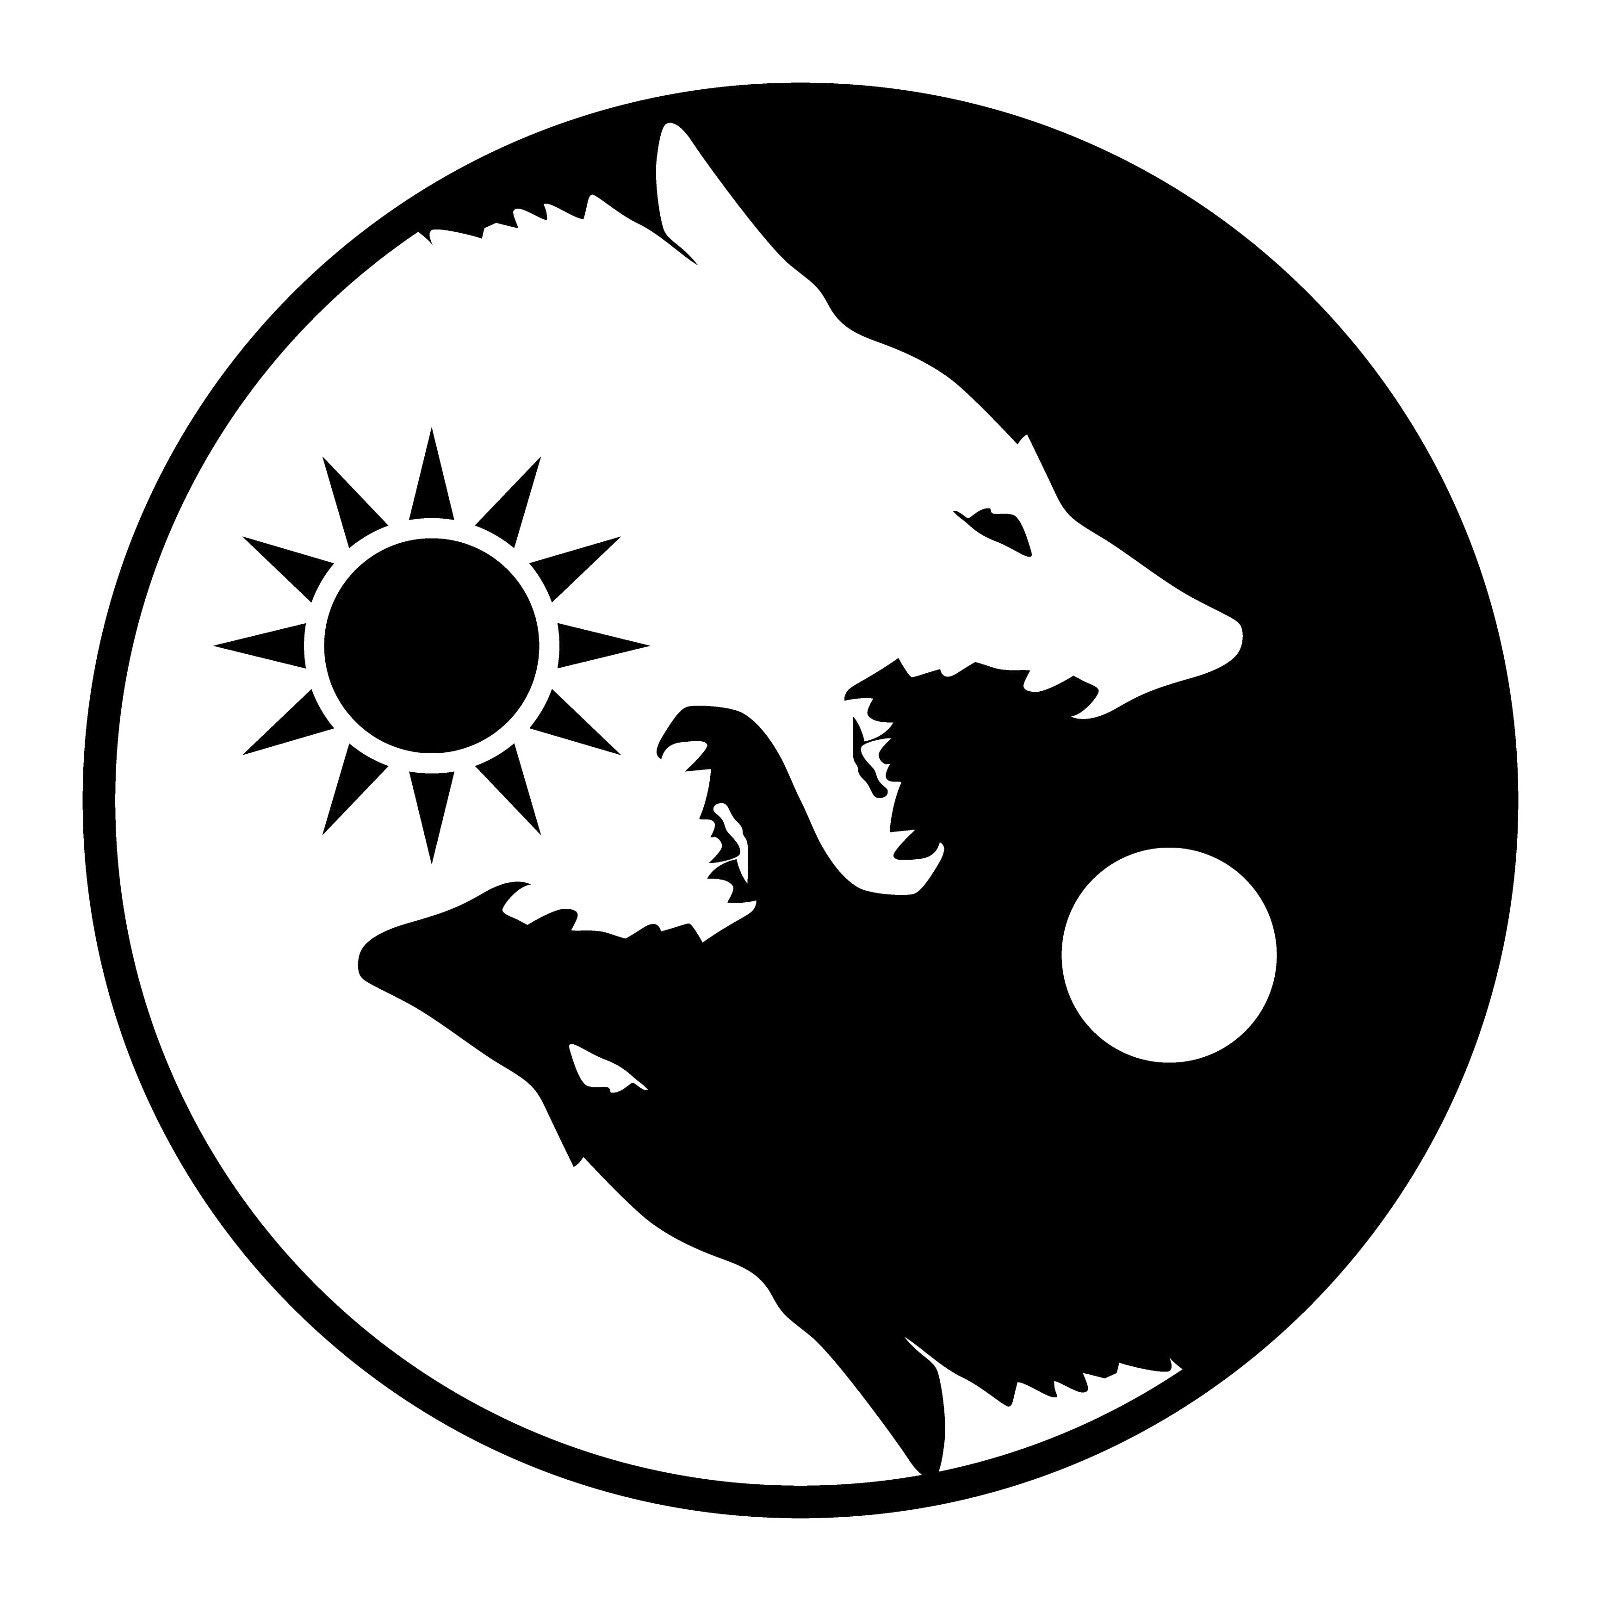 Image Result For Yin Yang Wolves Art Yin Yang Wolf Art Yin Yang